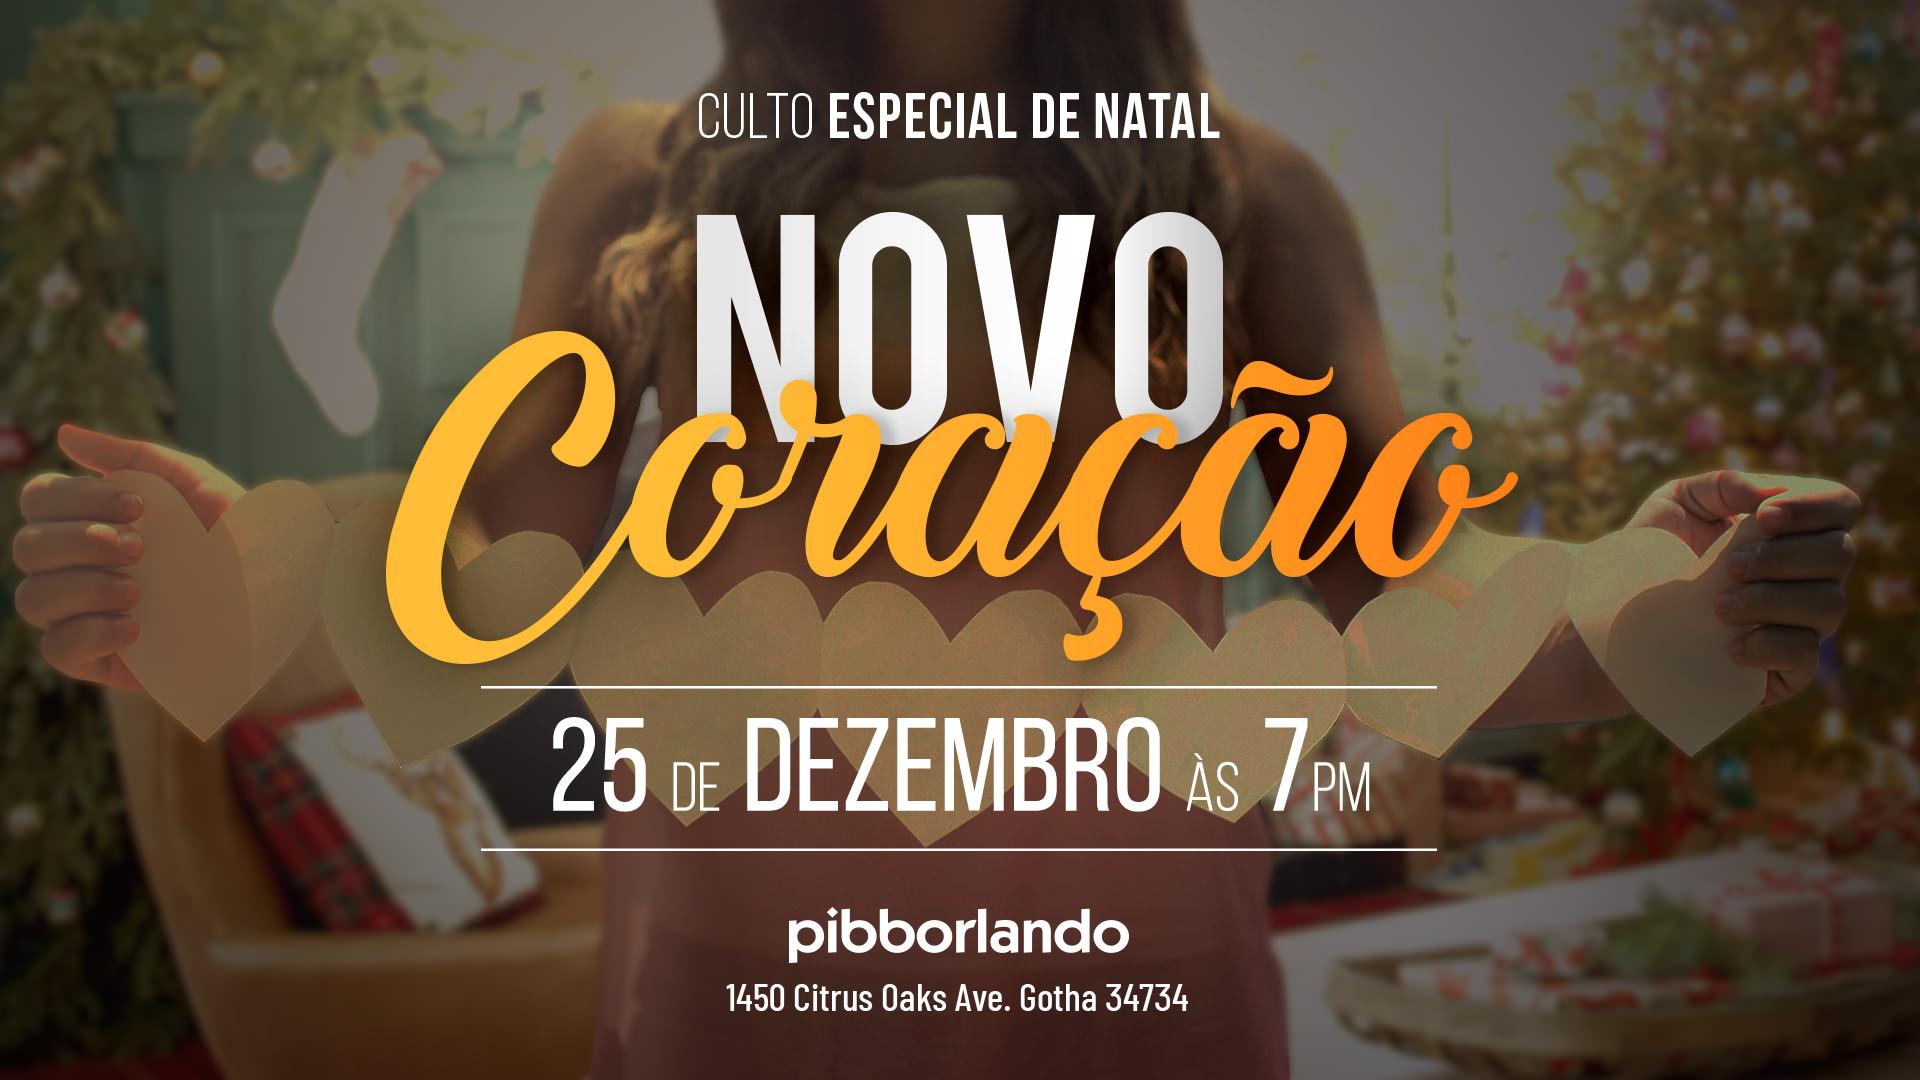 Natal_1920x1080_122018